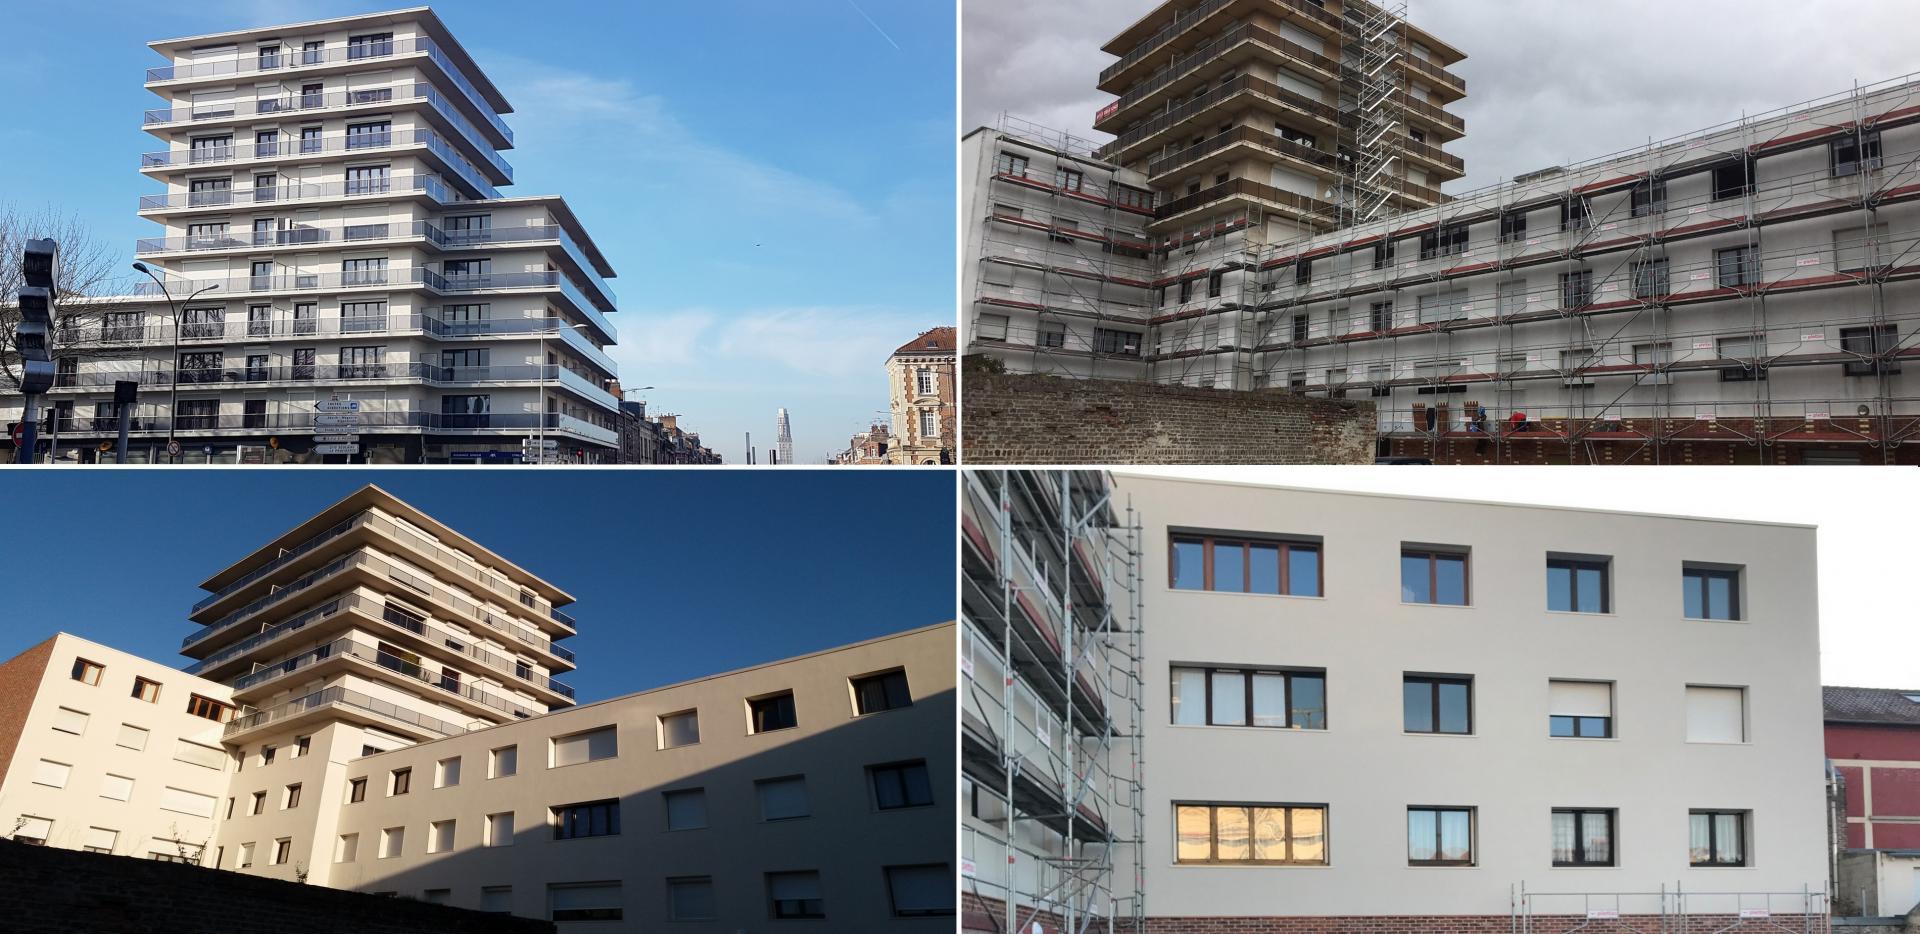 MASSET FRERES - Rénovation des façades